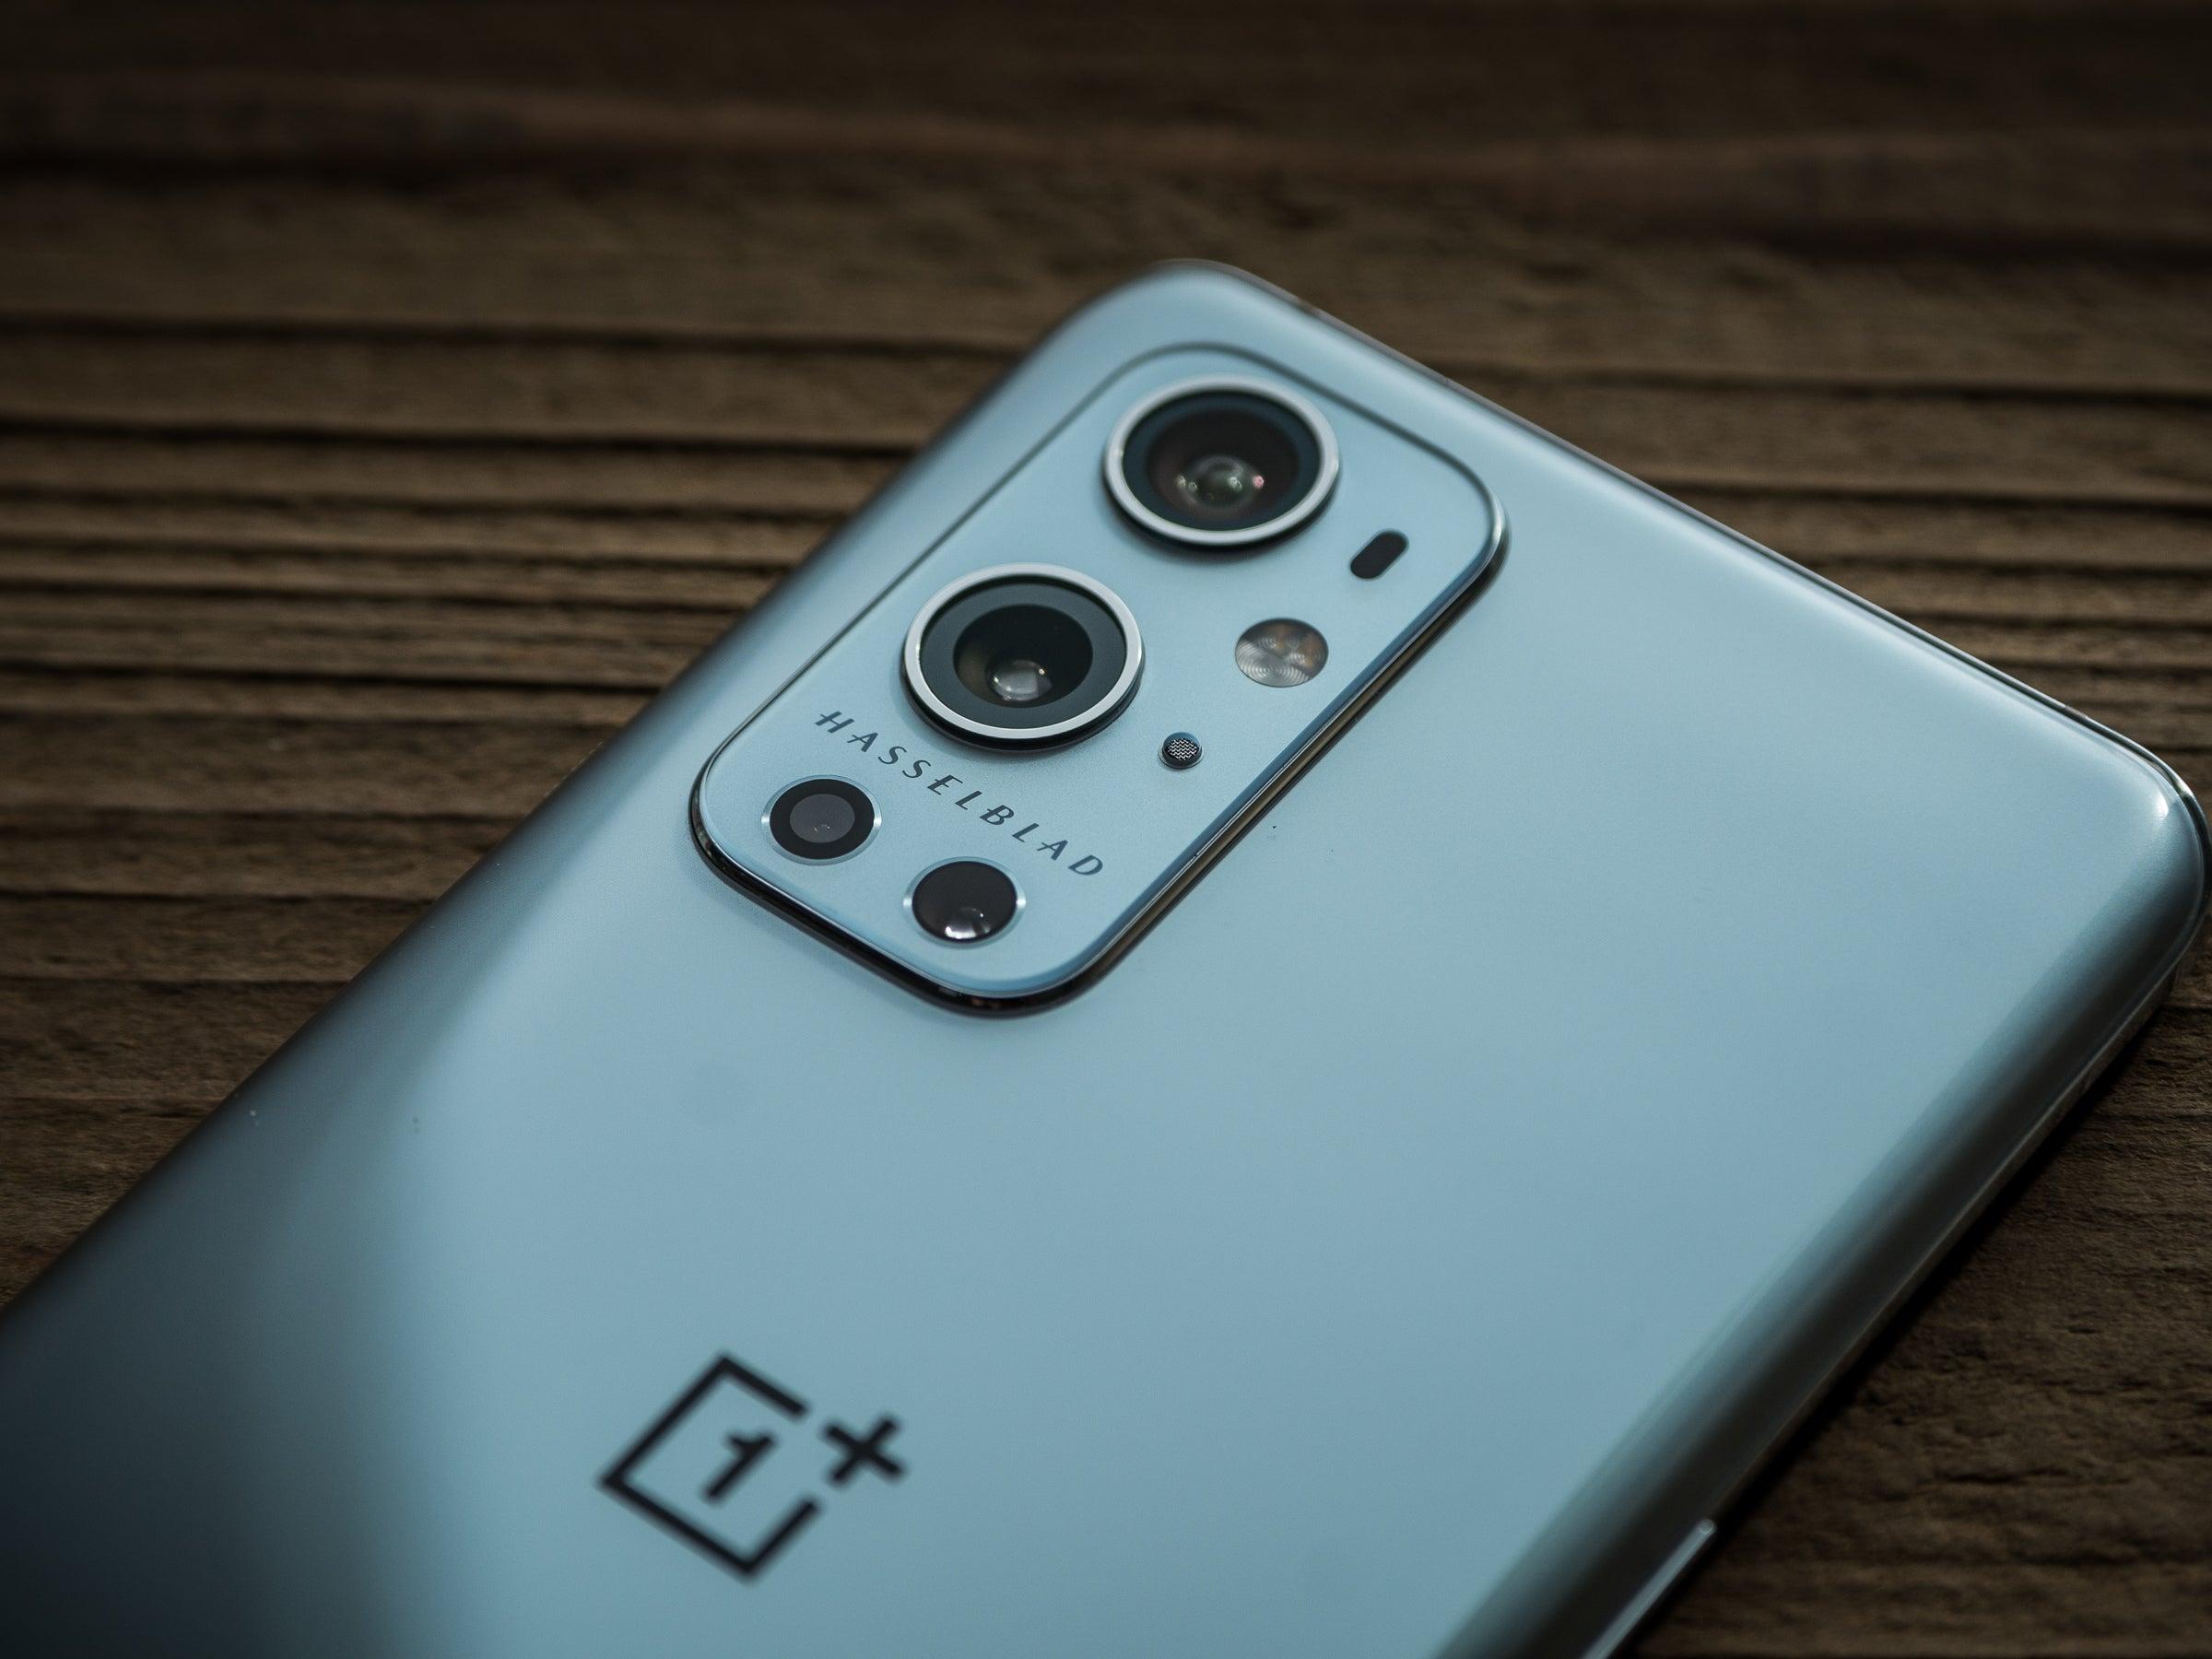 Die vier Kameras des Top-Smartphones